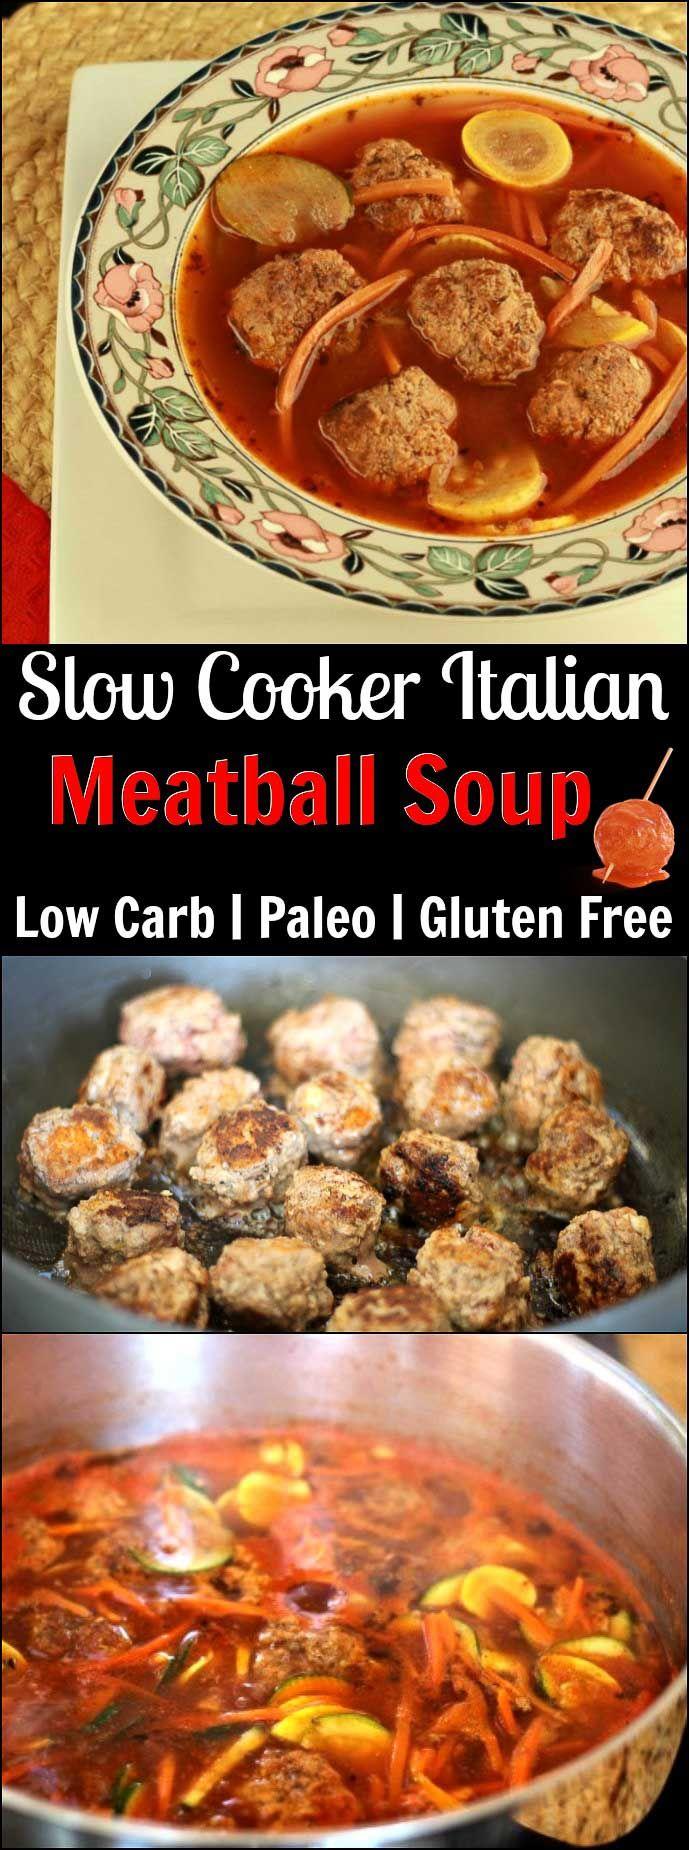 Paleo Italian Meatball Soup- Low carb and paleo